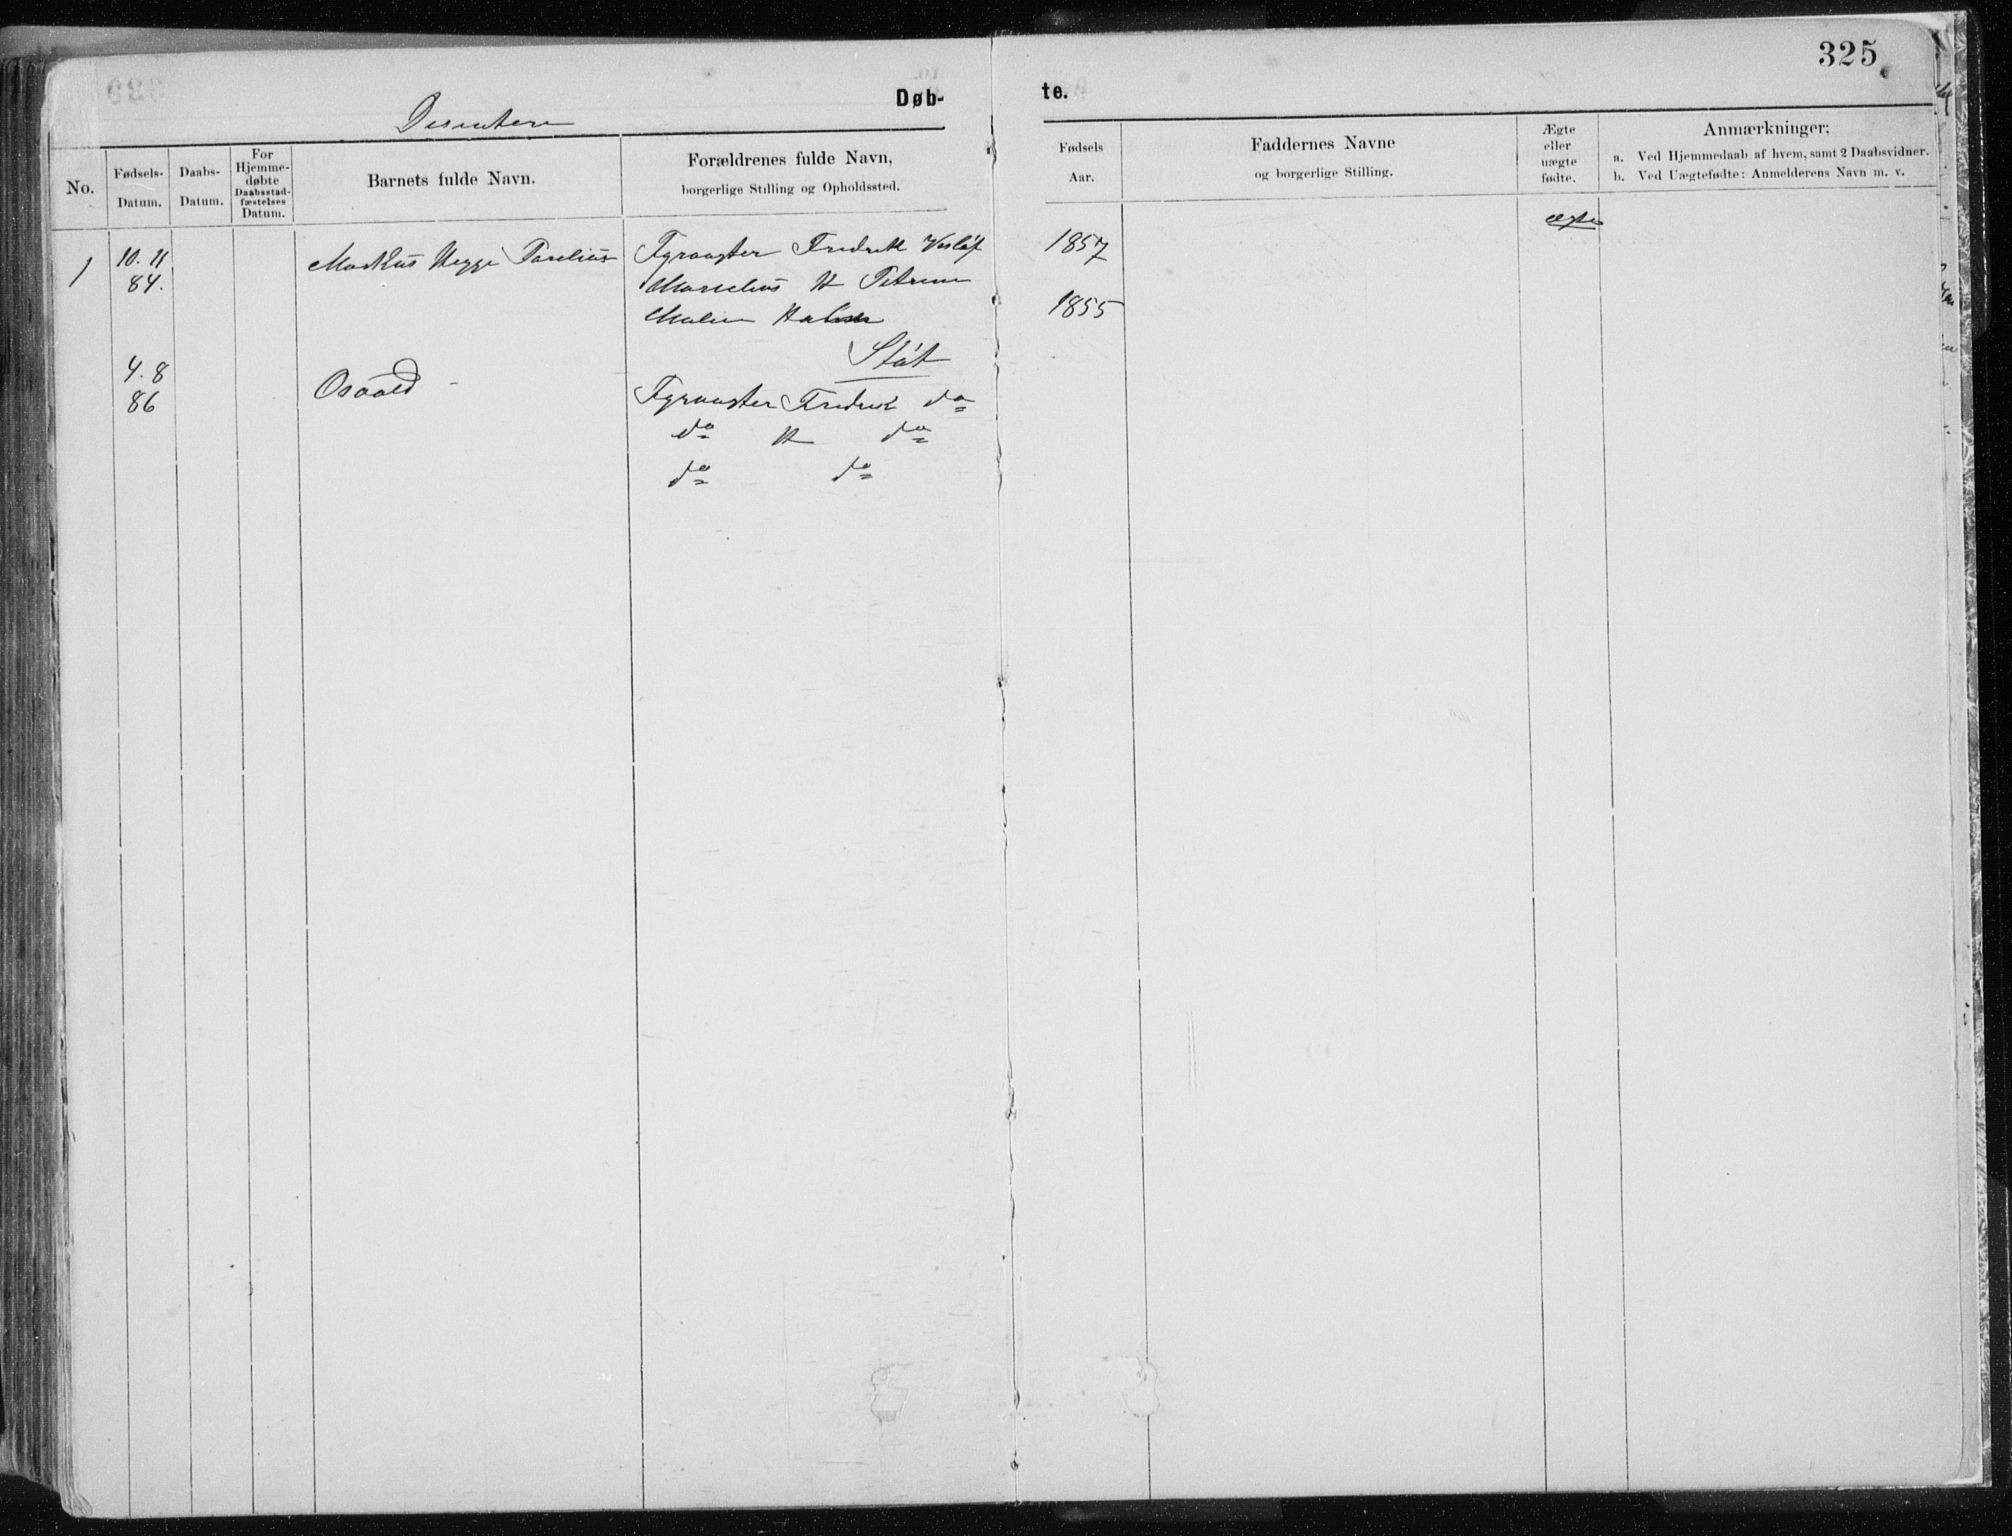 SAT, Ministerialprotokoller, klokkerbøker og fødselsregistre - Nordland, 843/L0636: Klokkerbok nr. 843C05, 1884-1909, s. 325